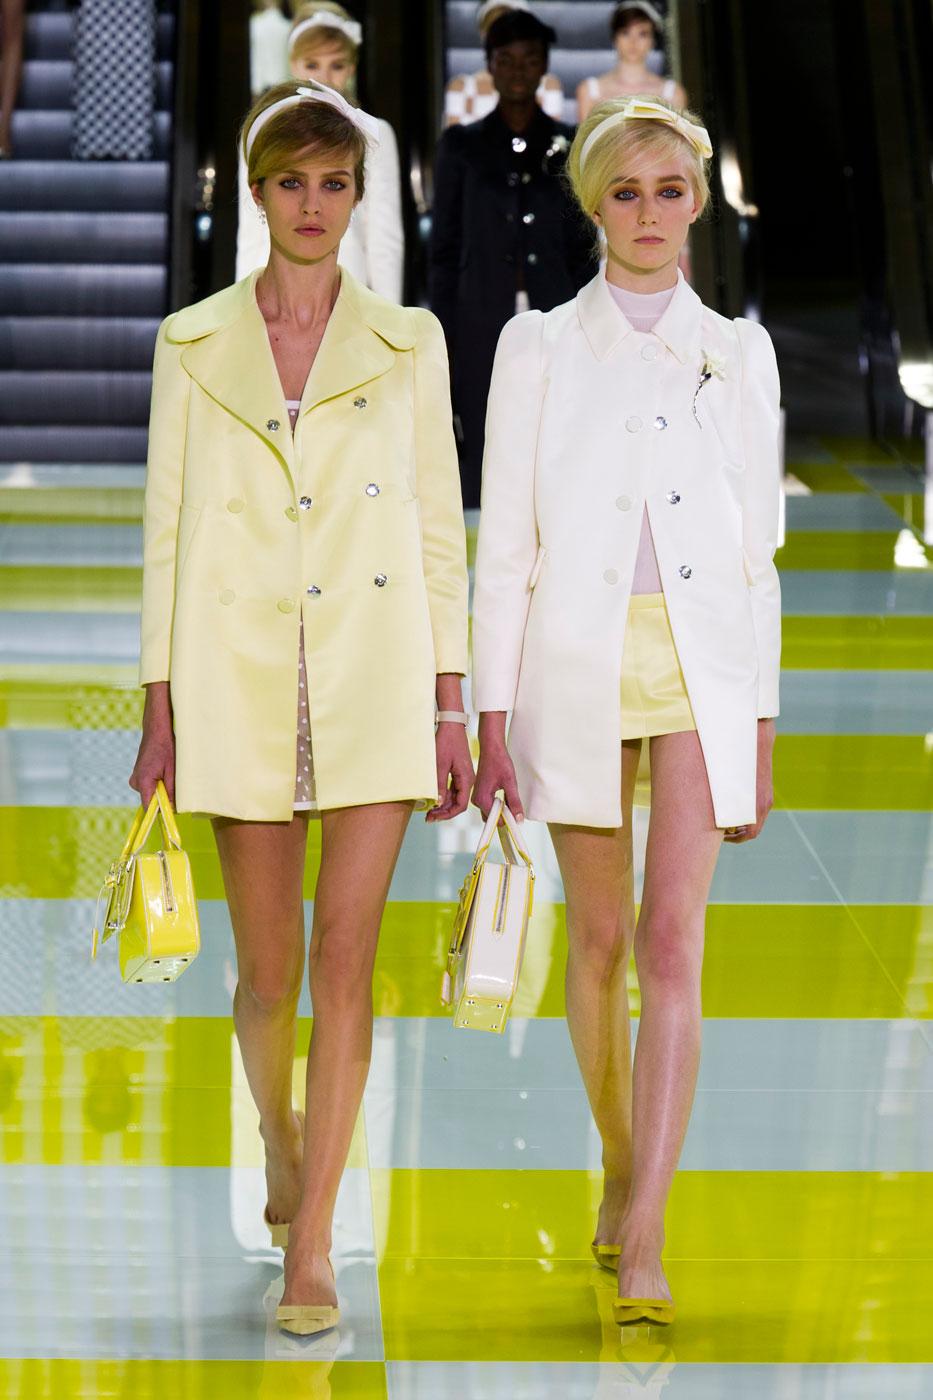 35 louis vuitton fashionista.com